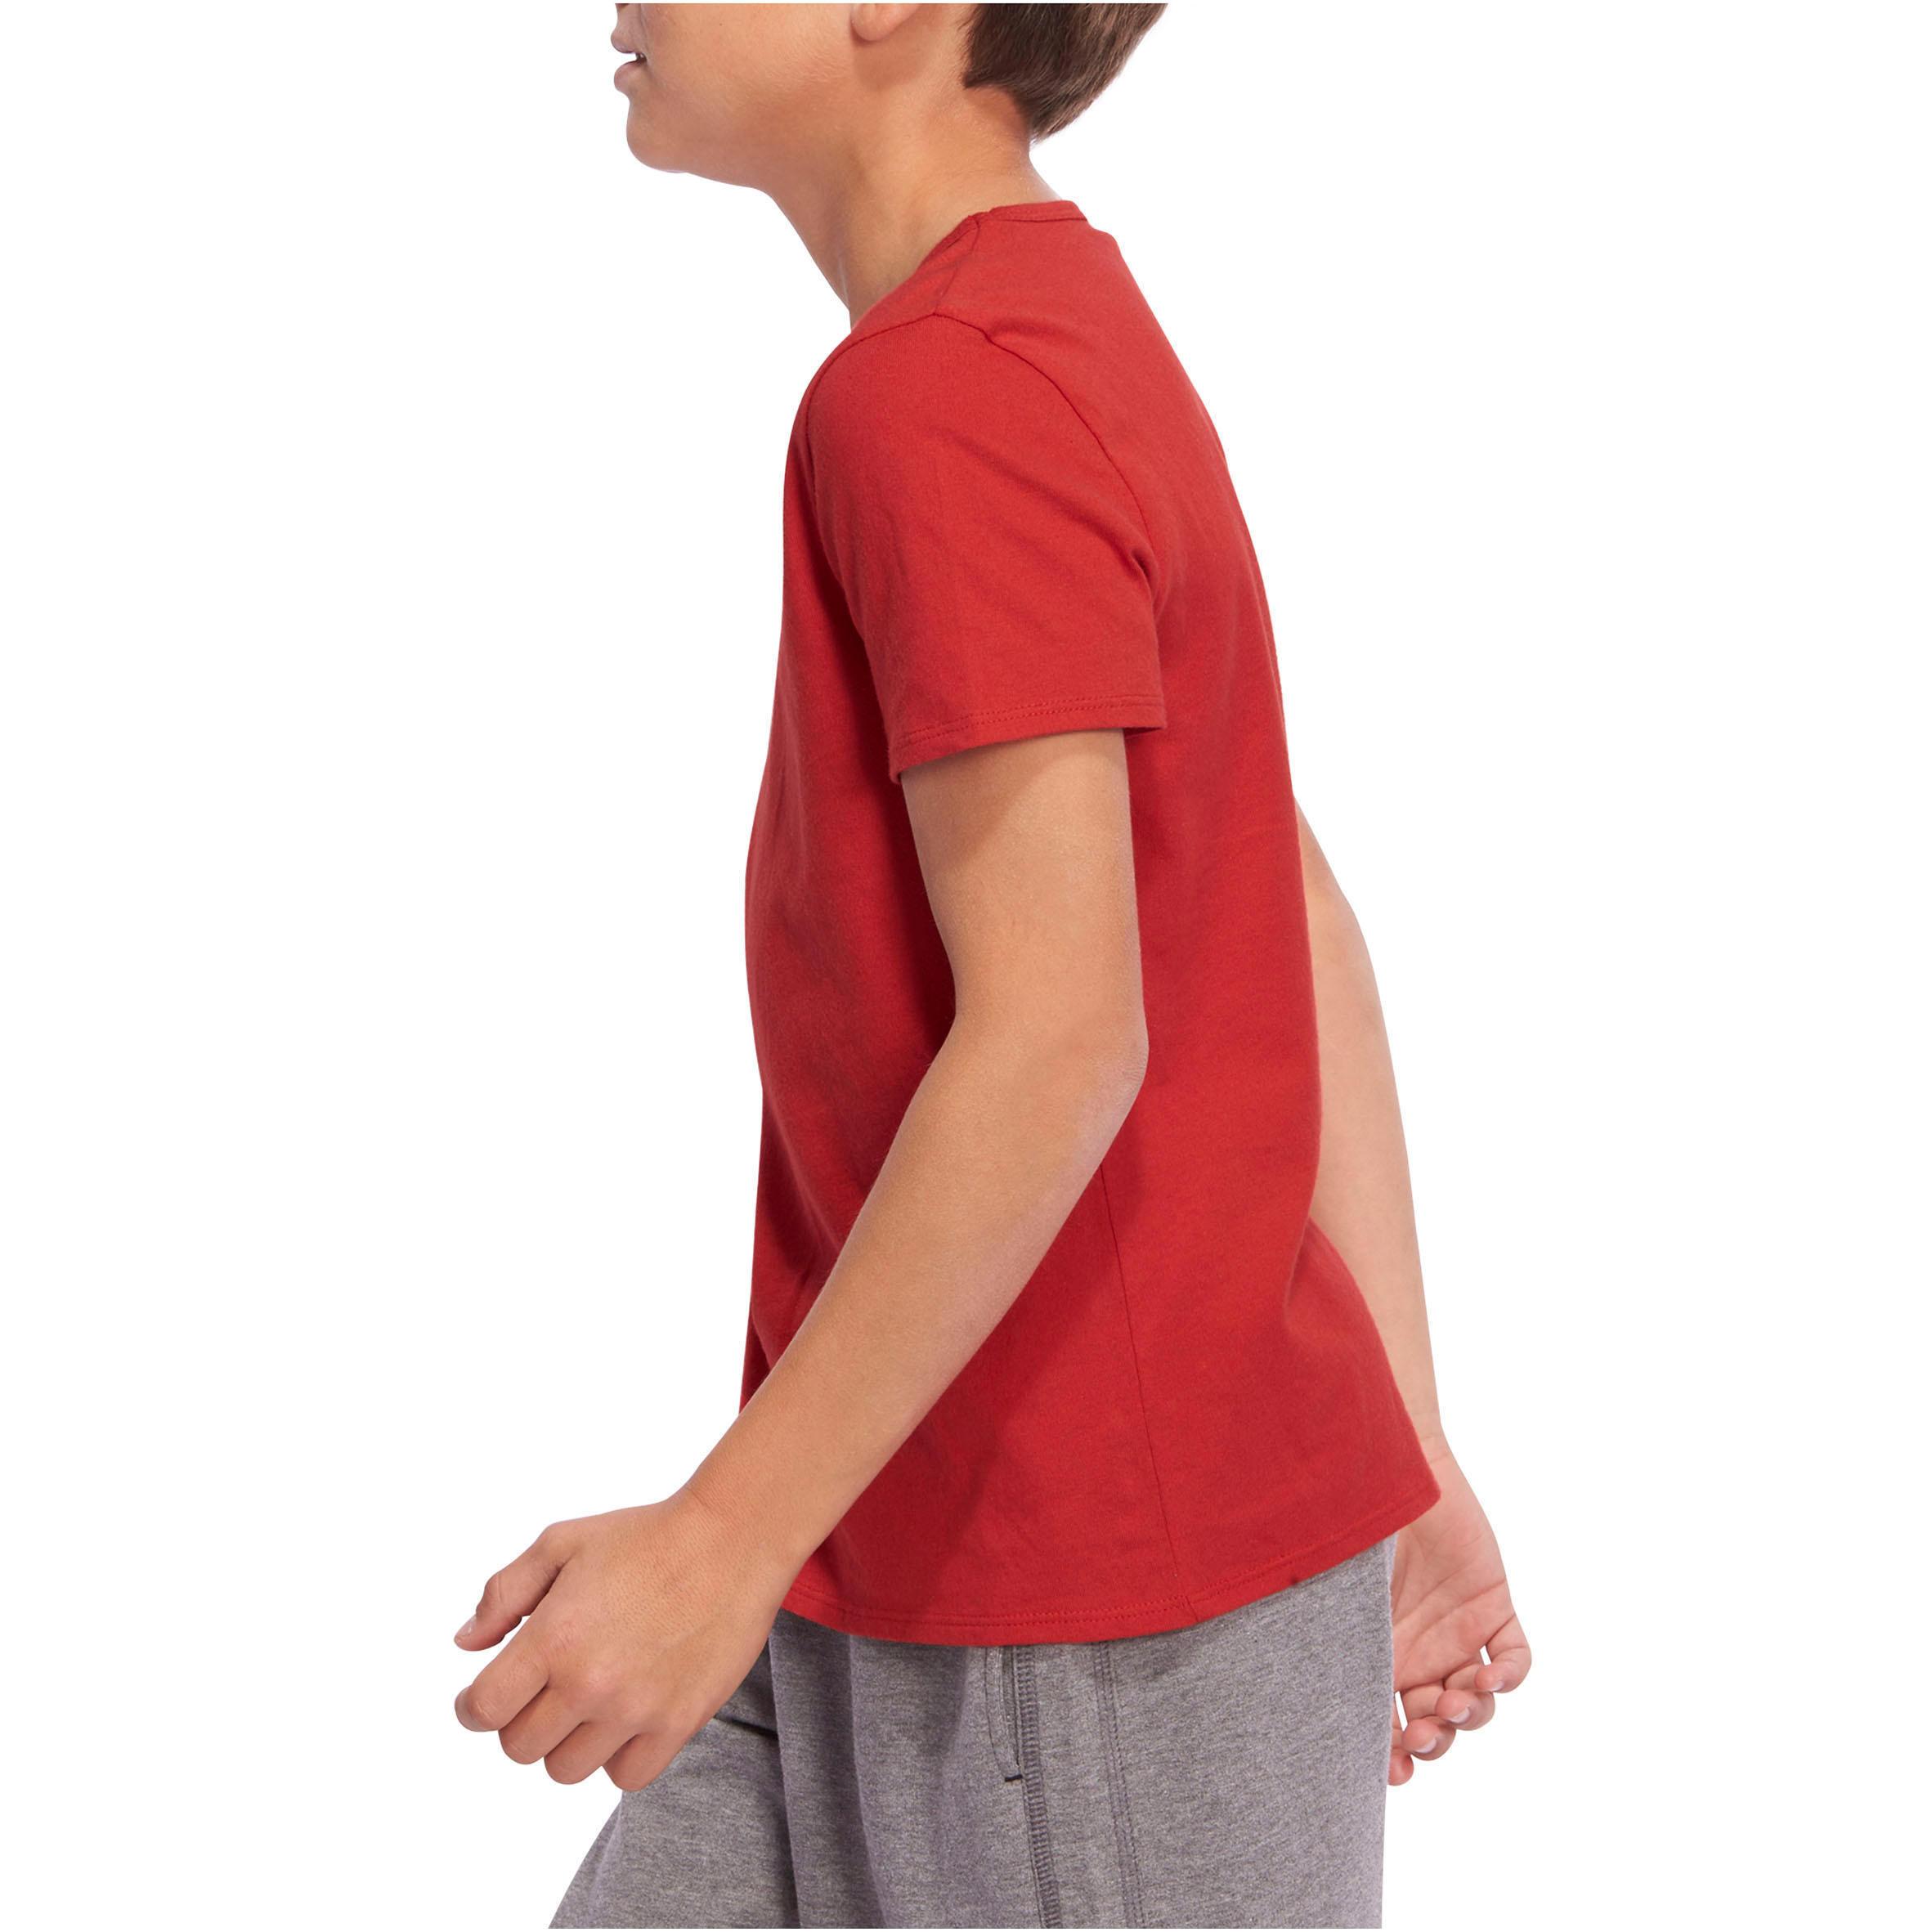 100 Boys' Short-Sleeved Gym T-Shirt - Red